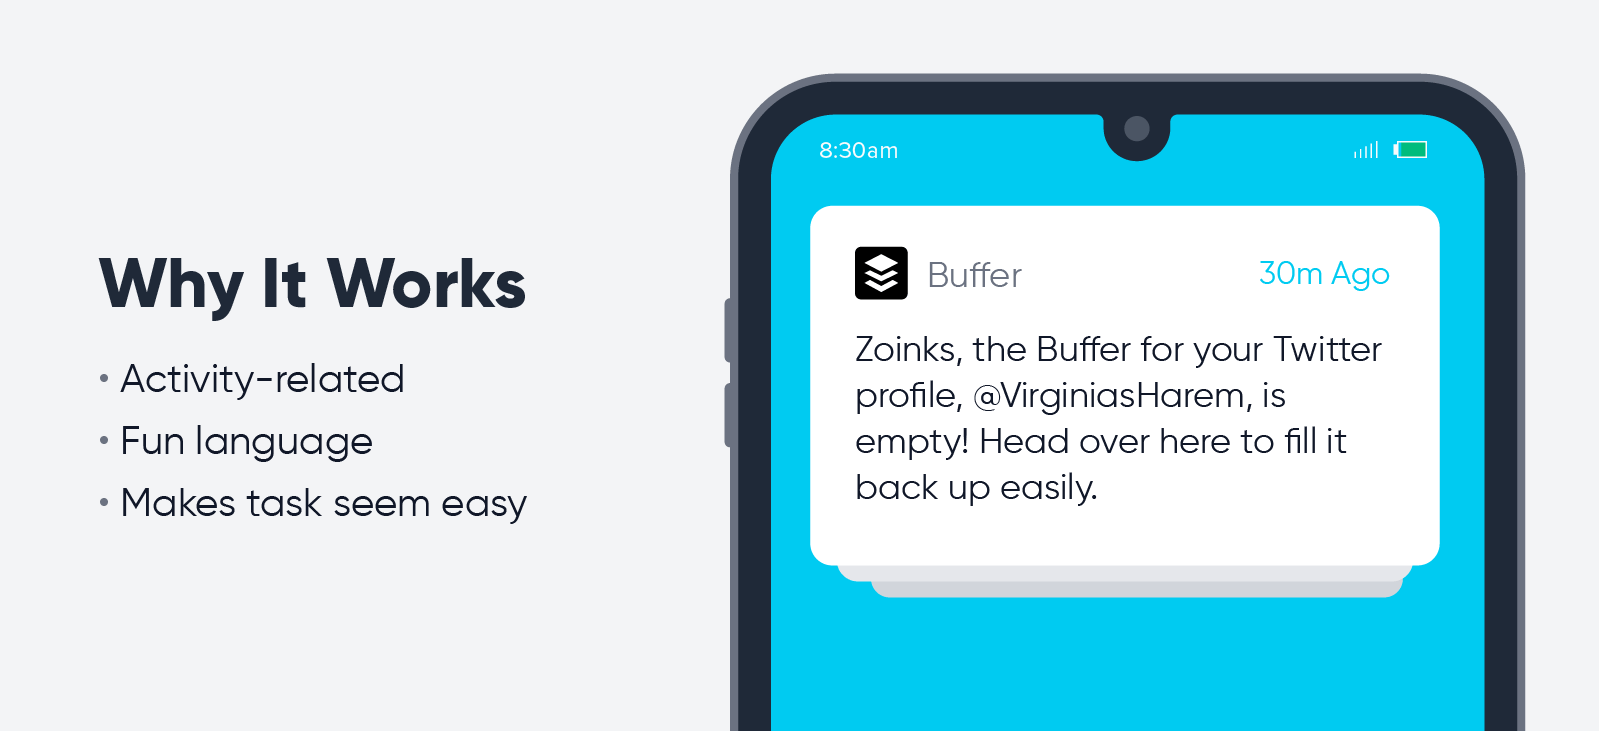 Buffer - push notification best practices